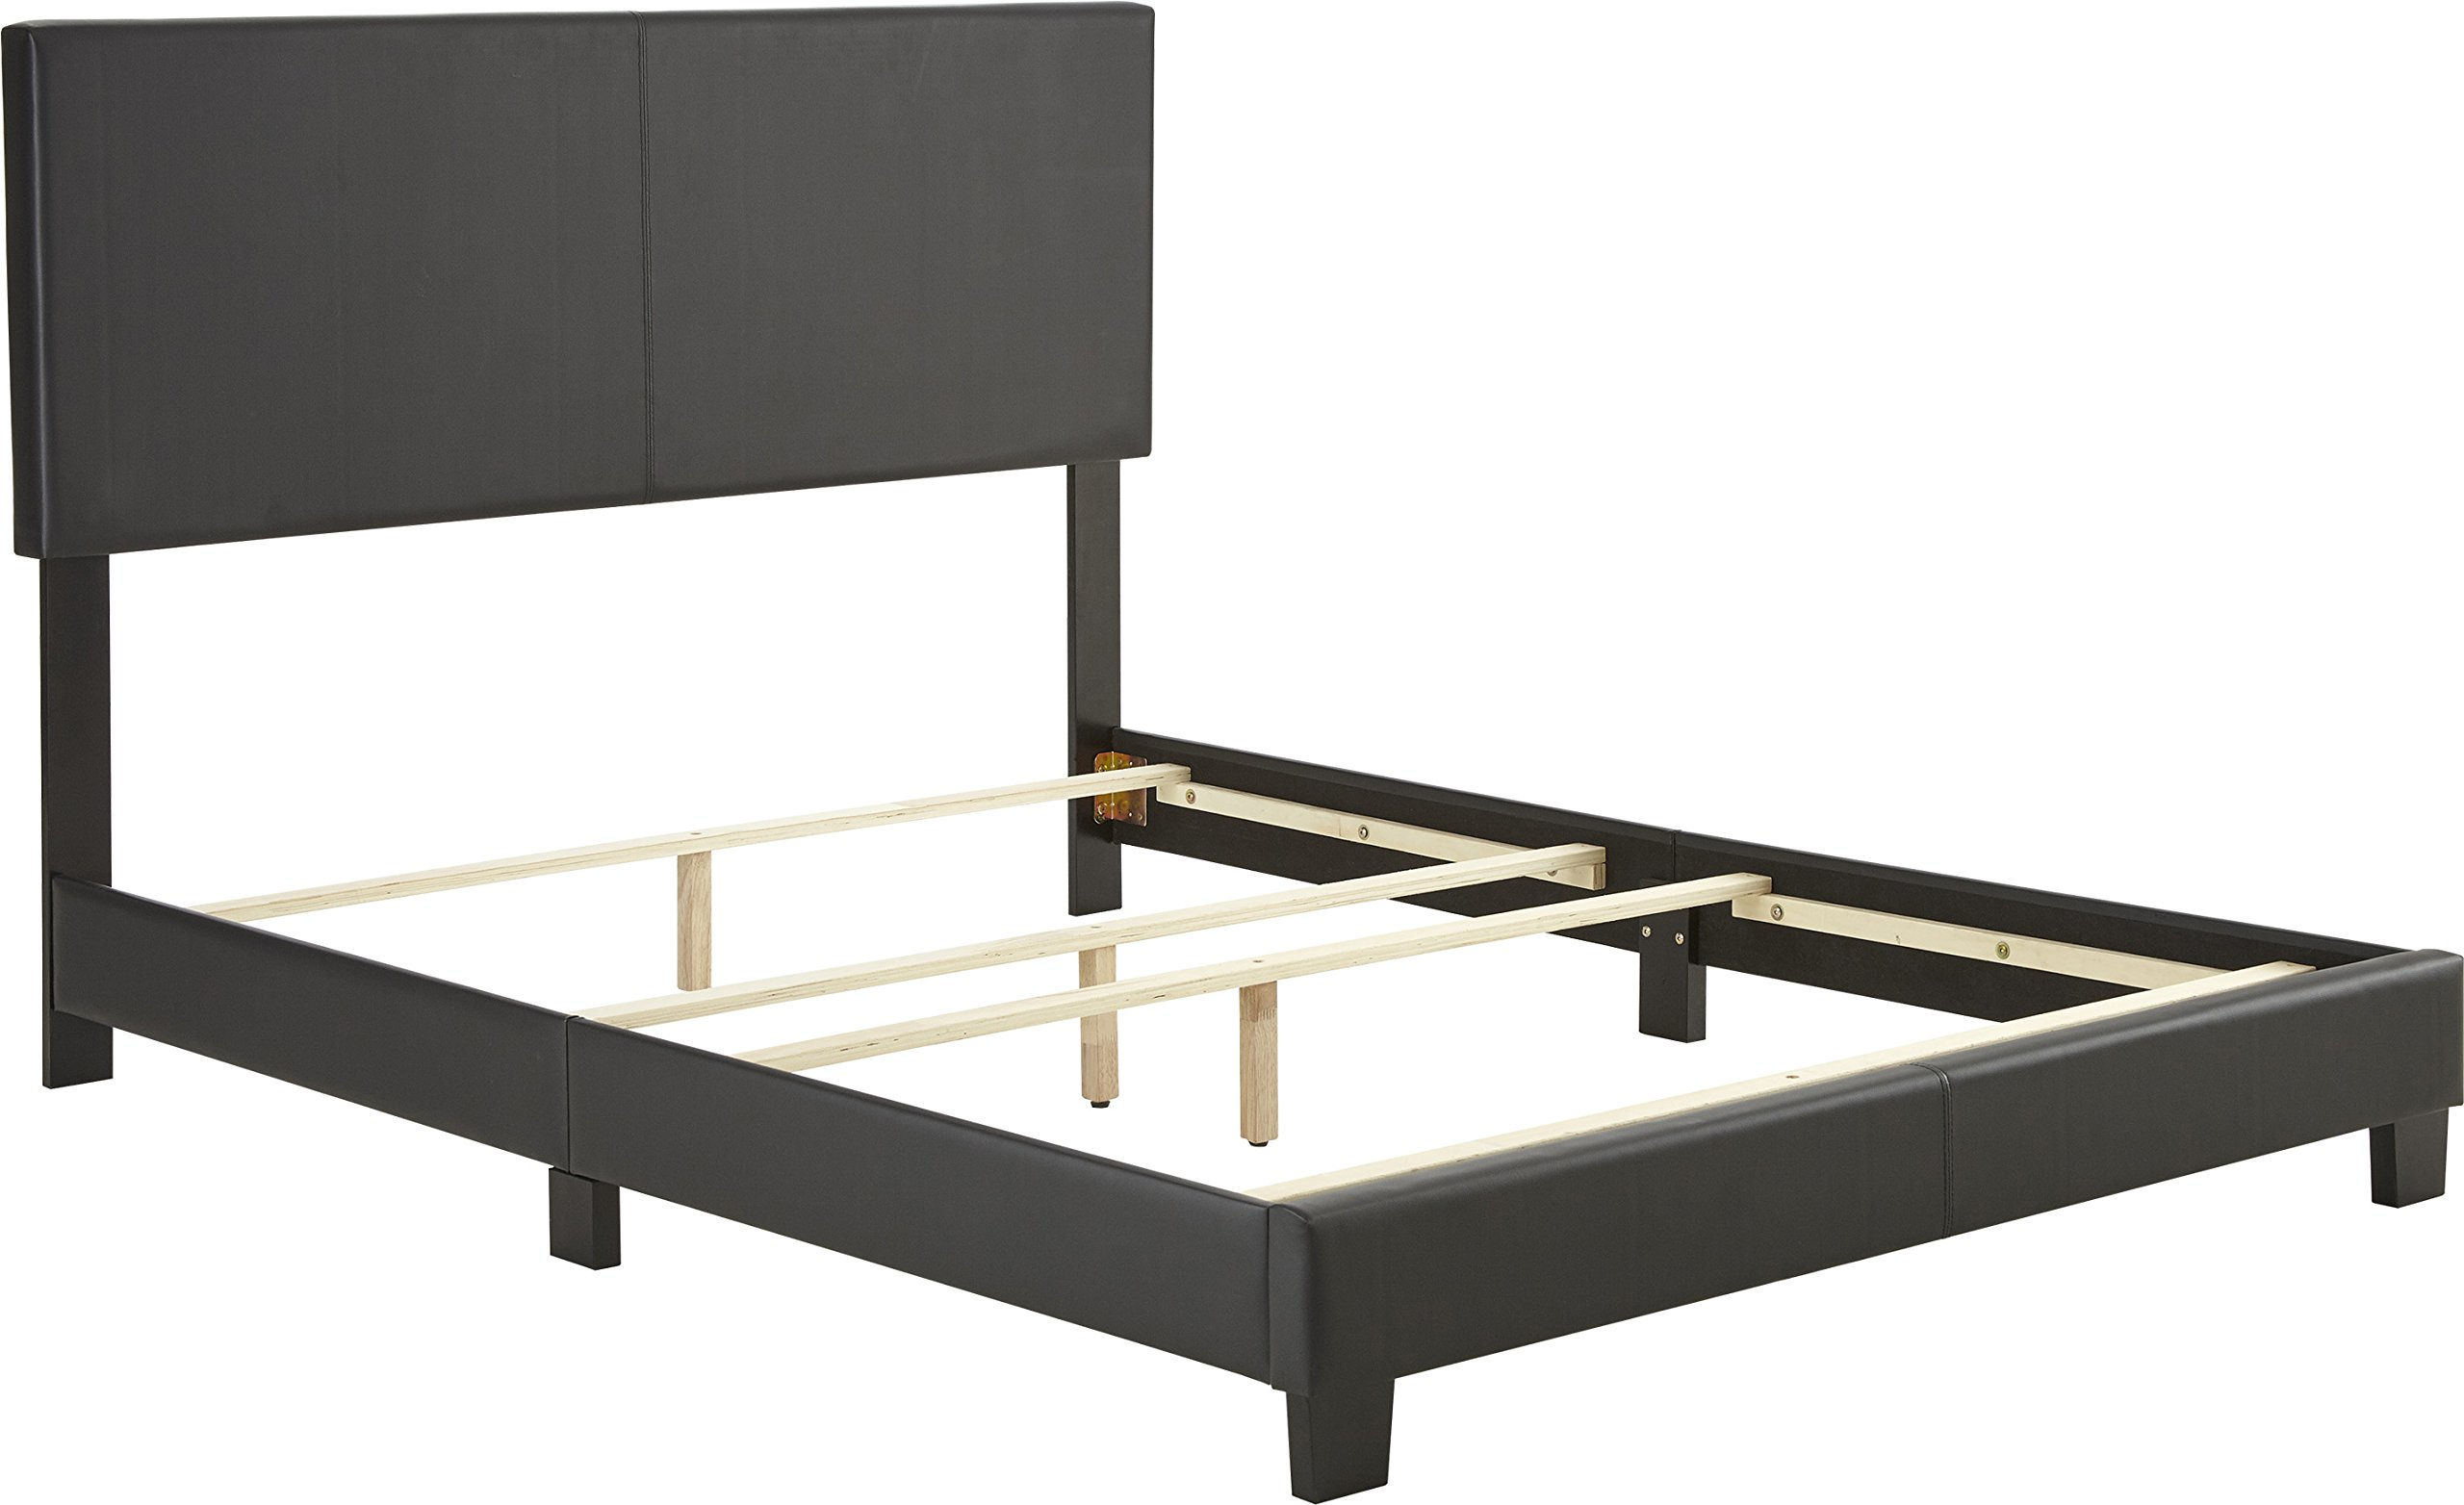 Flex Form Montana Upholstered Platform Bed Frame with Headboard: Faux Leather, Black, Full